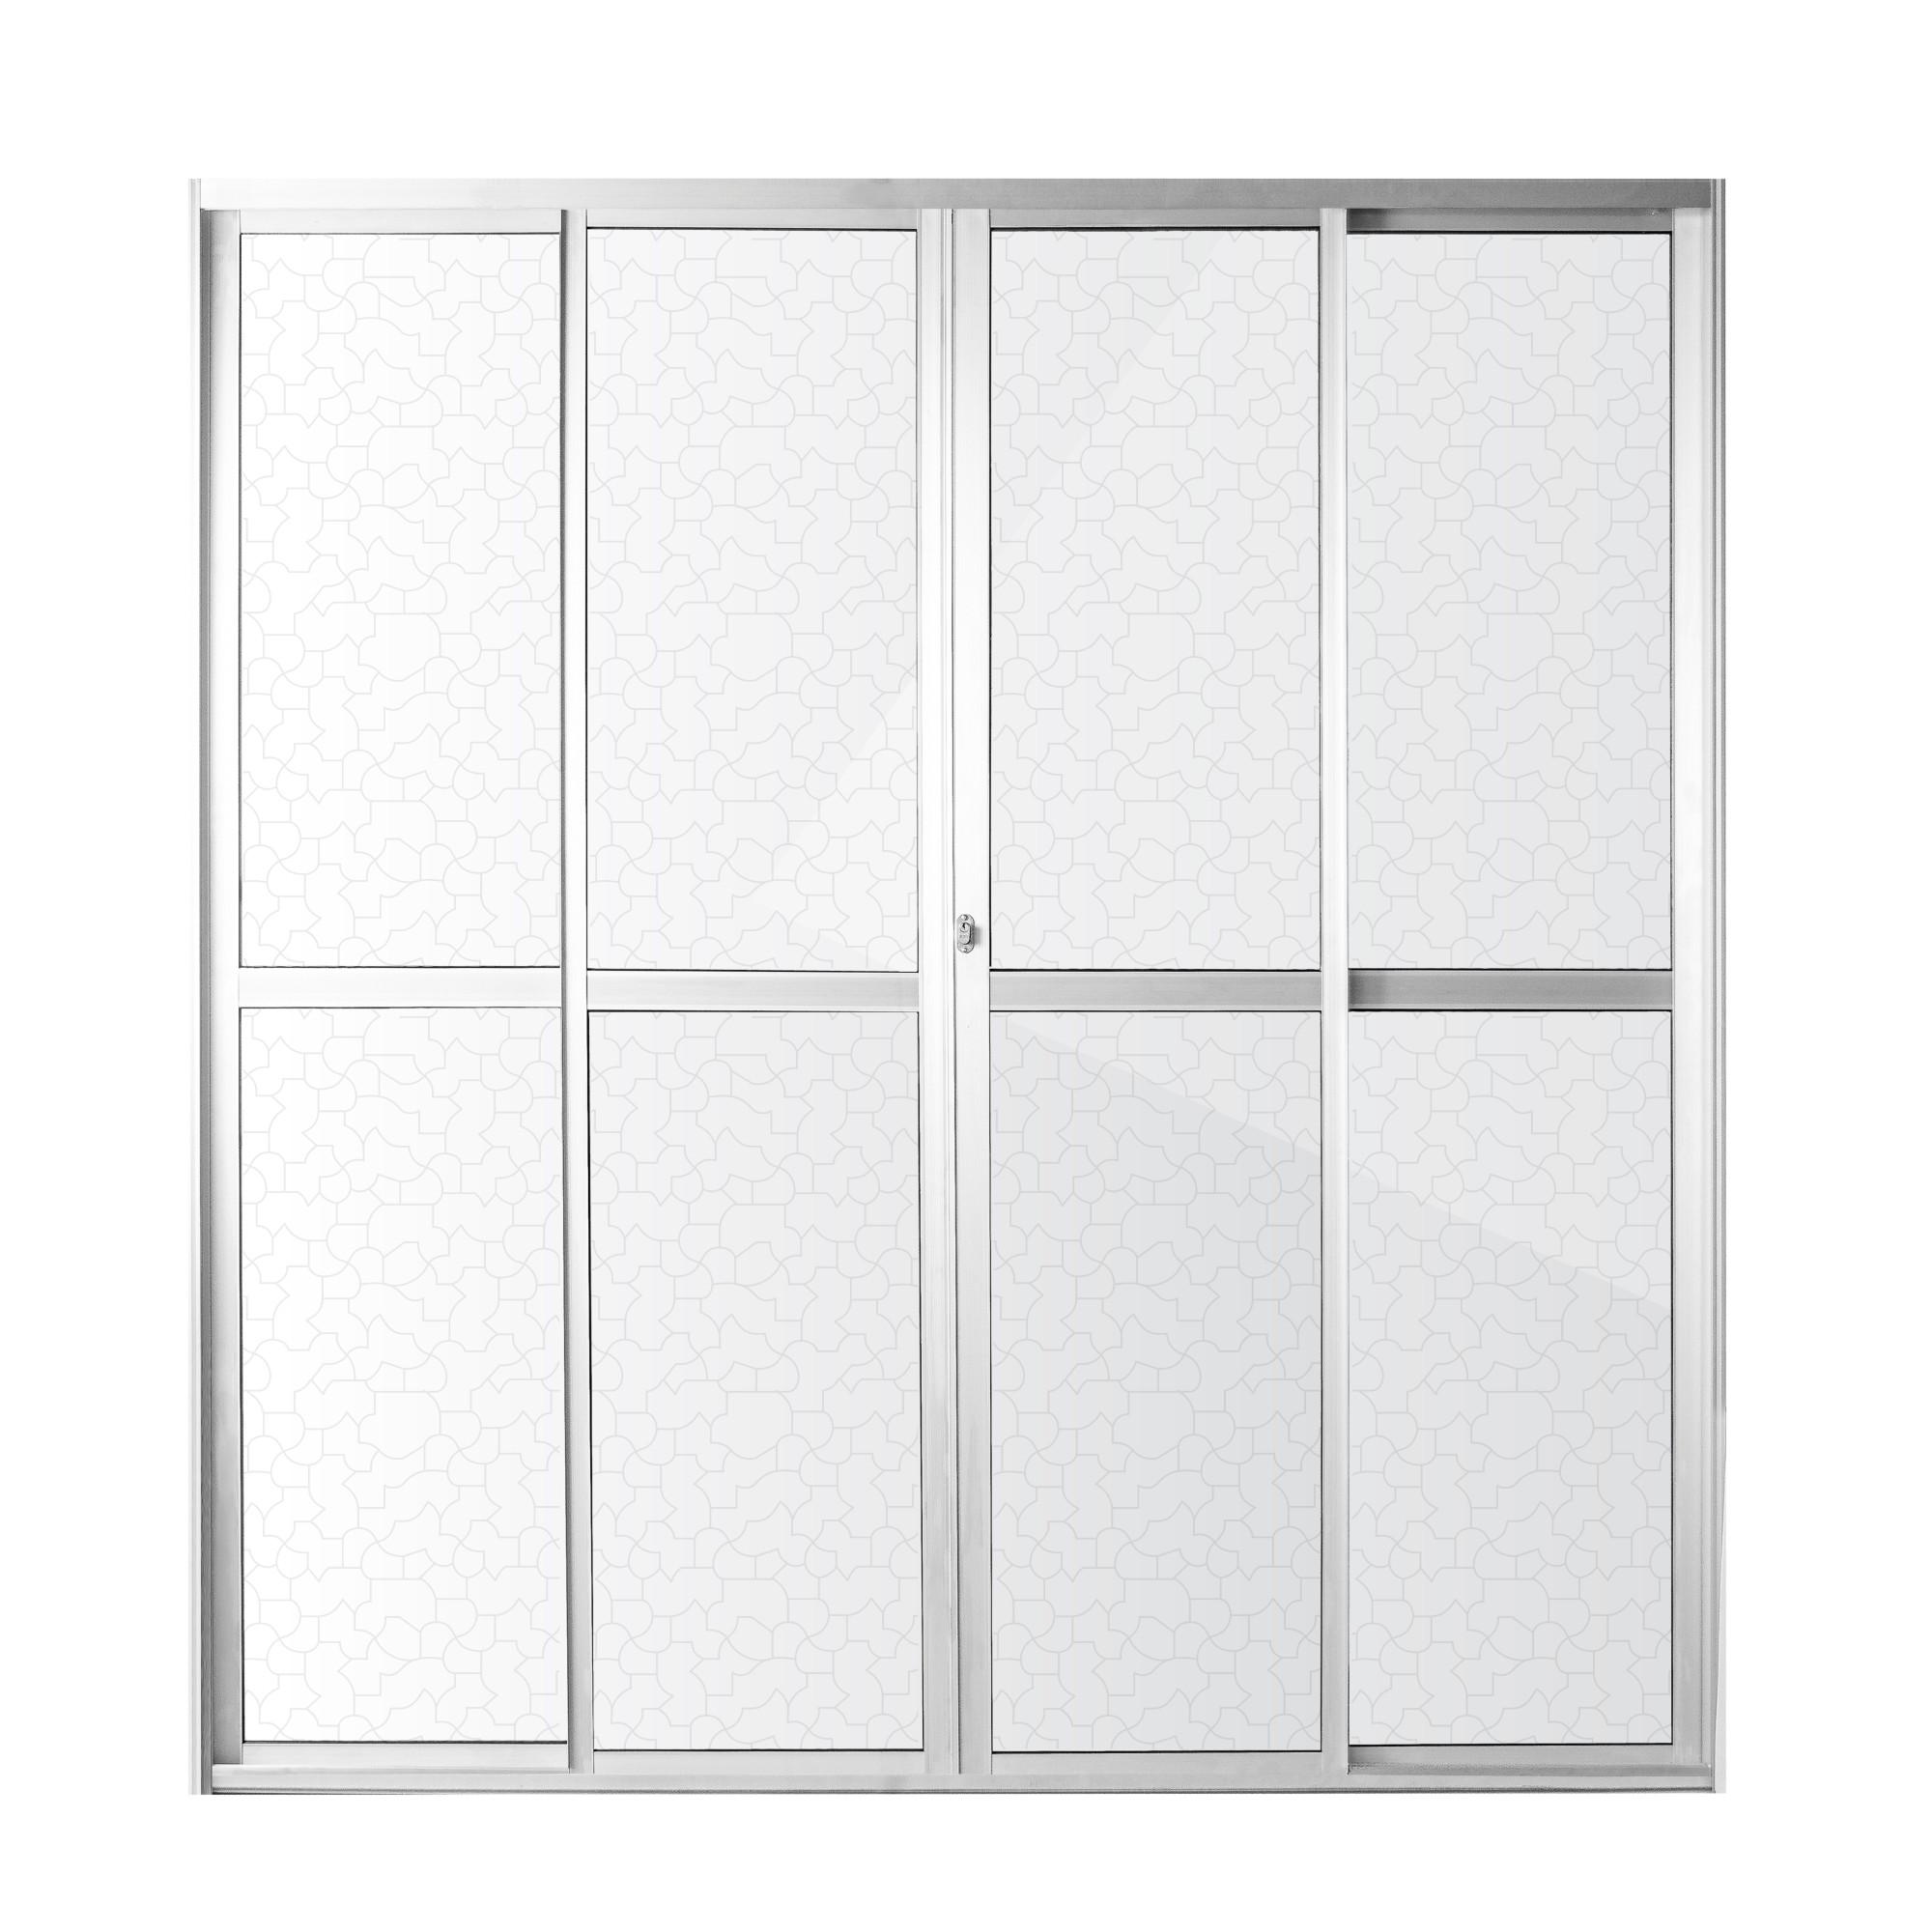 Porta Balcao de Aluminio 4 Folhas 210cm x 200cm Marine Natural - Aluvid